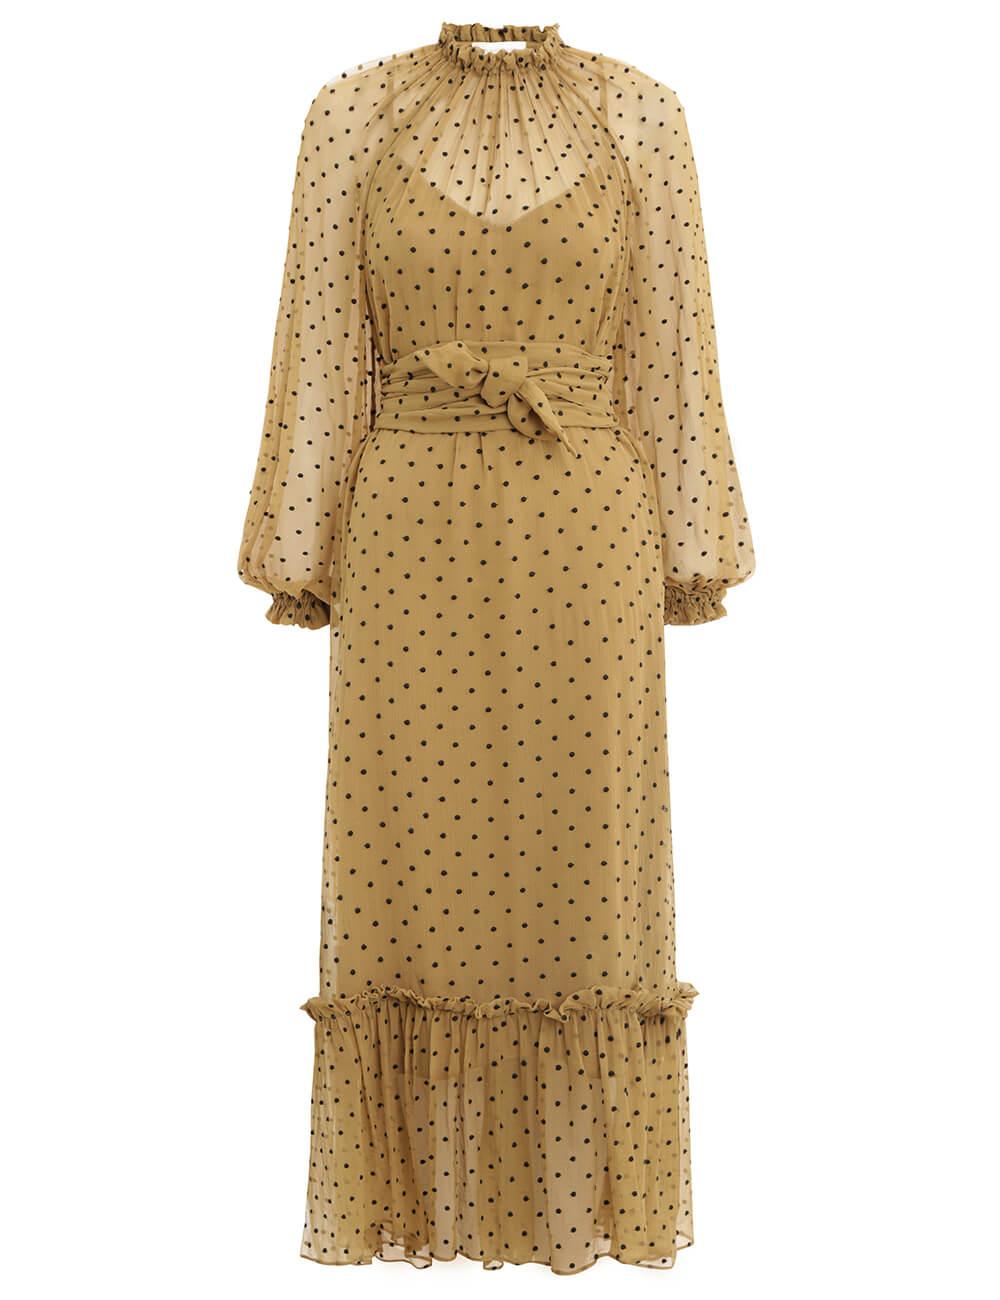 b8d5bb510 Shop Designer Dresses Online | ZIMMERMANN